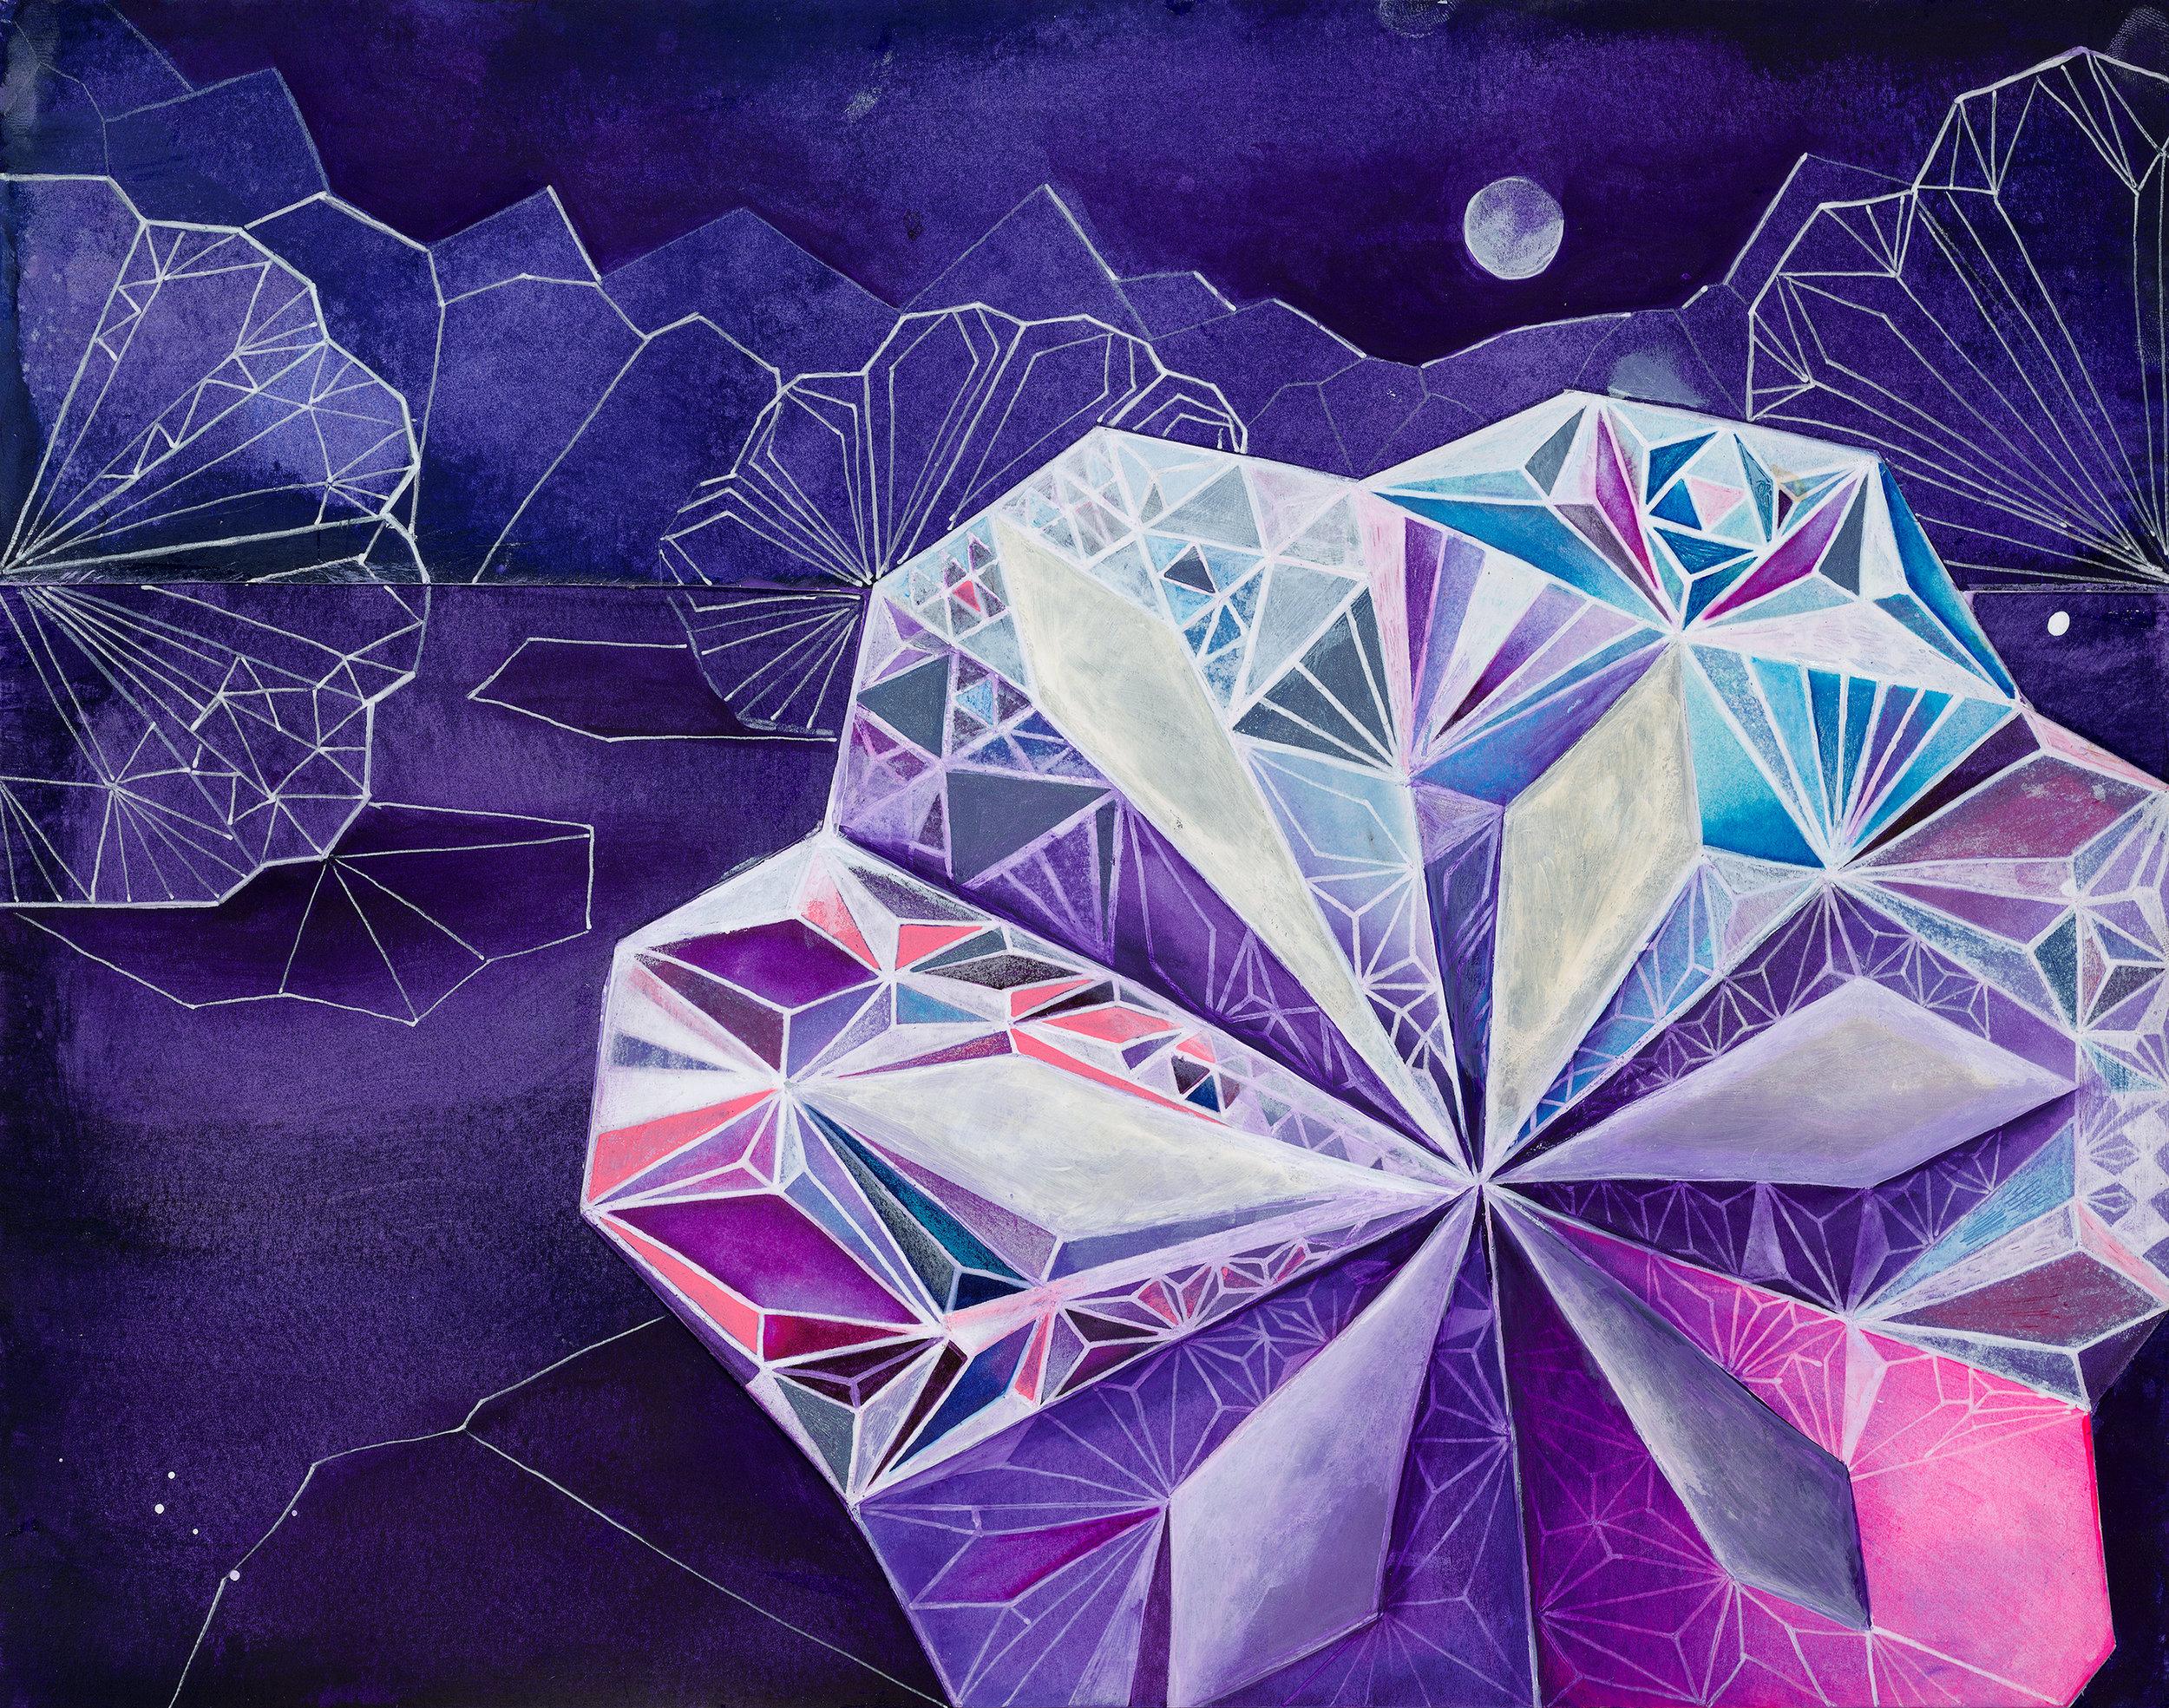 Constellation Crystals